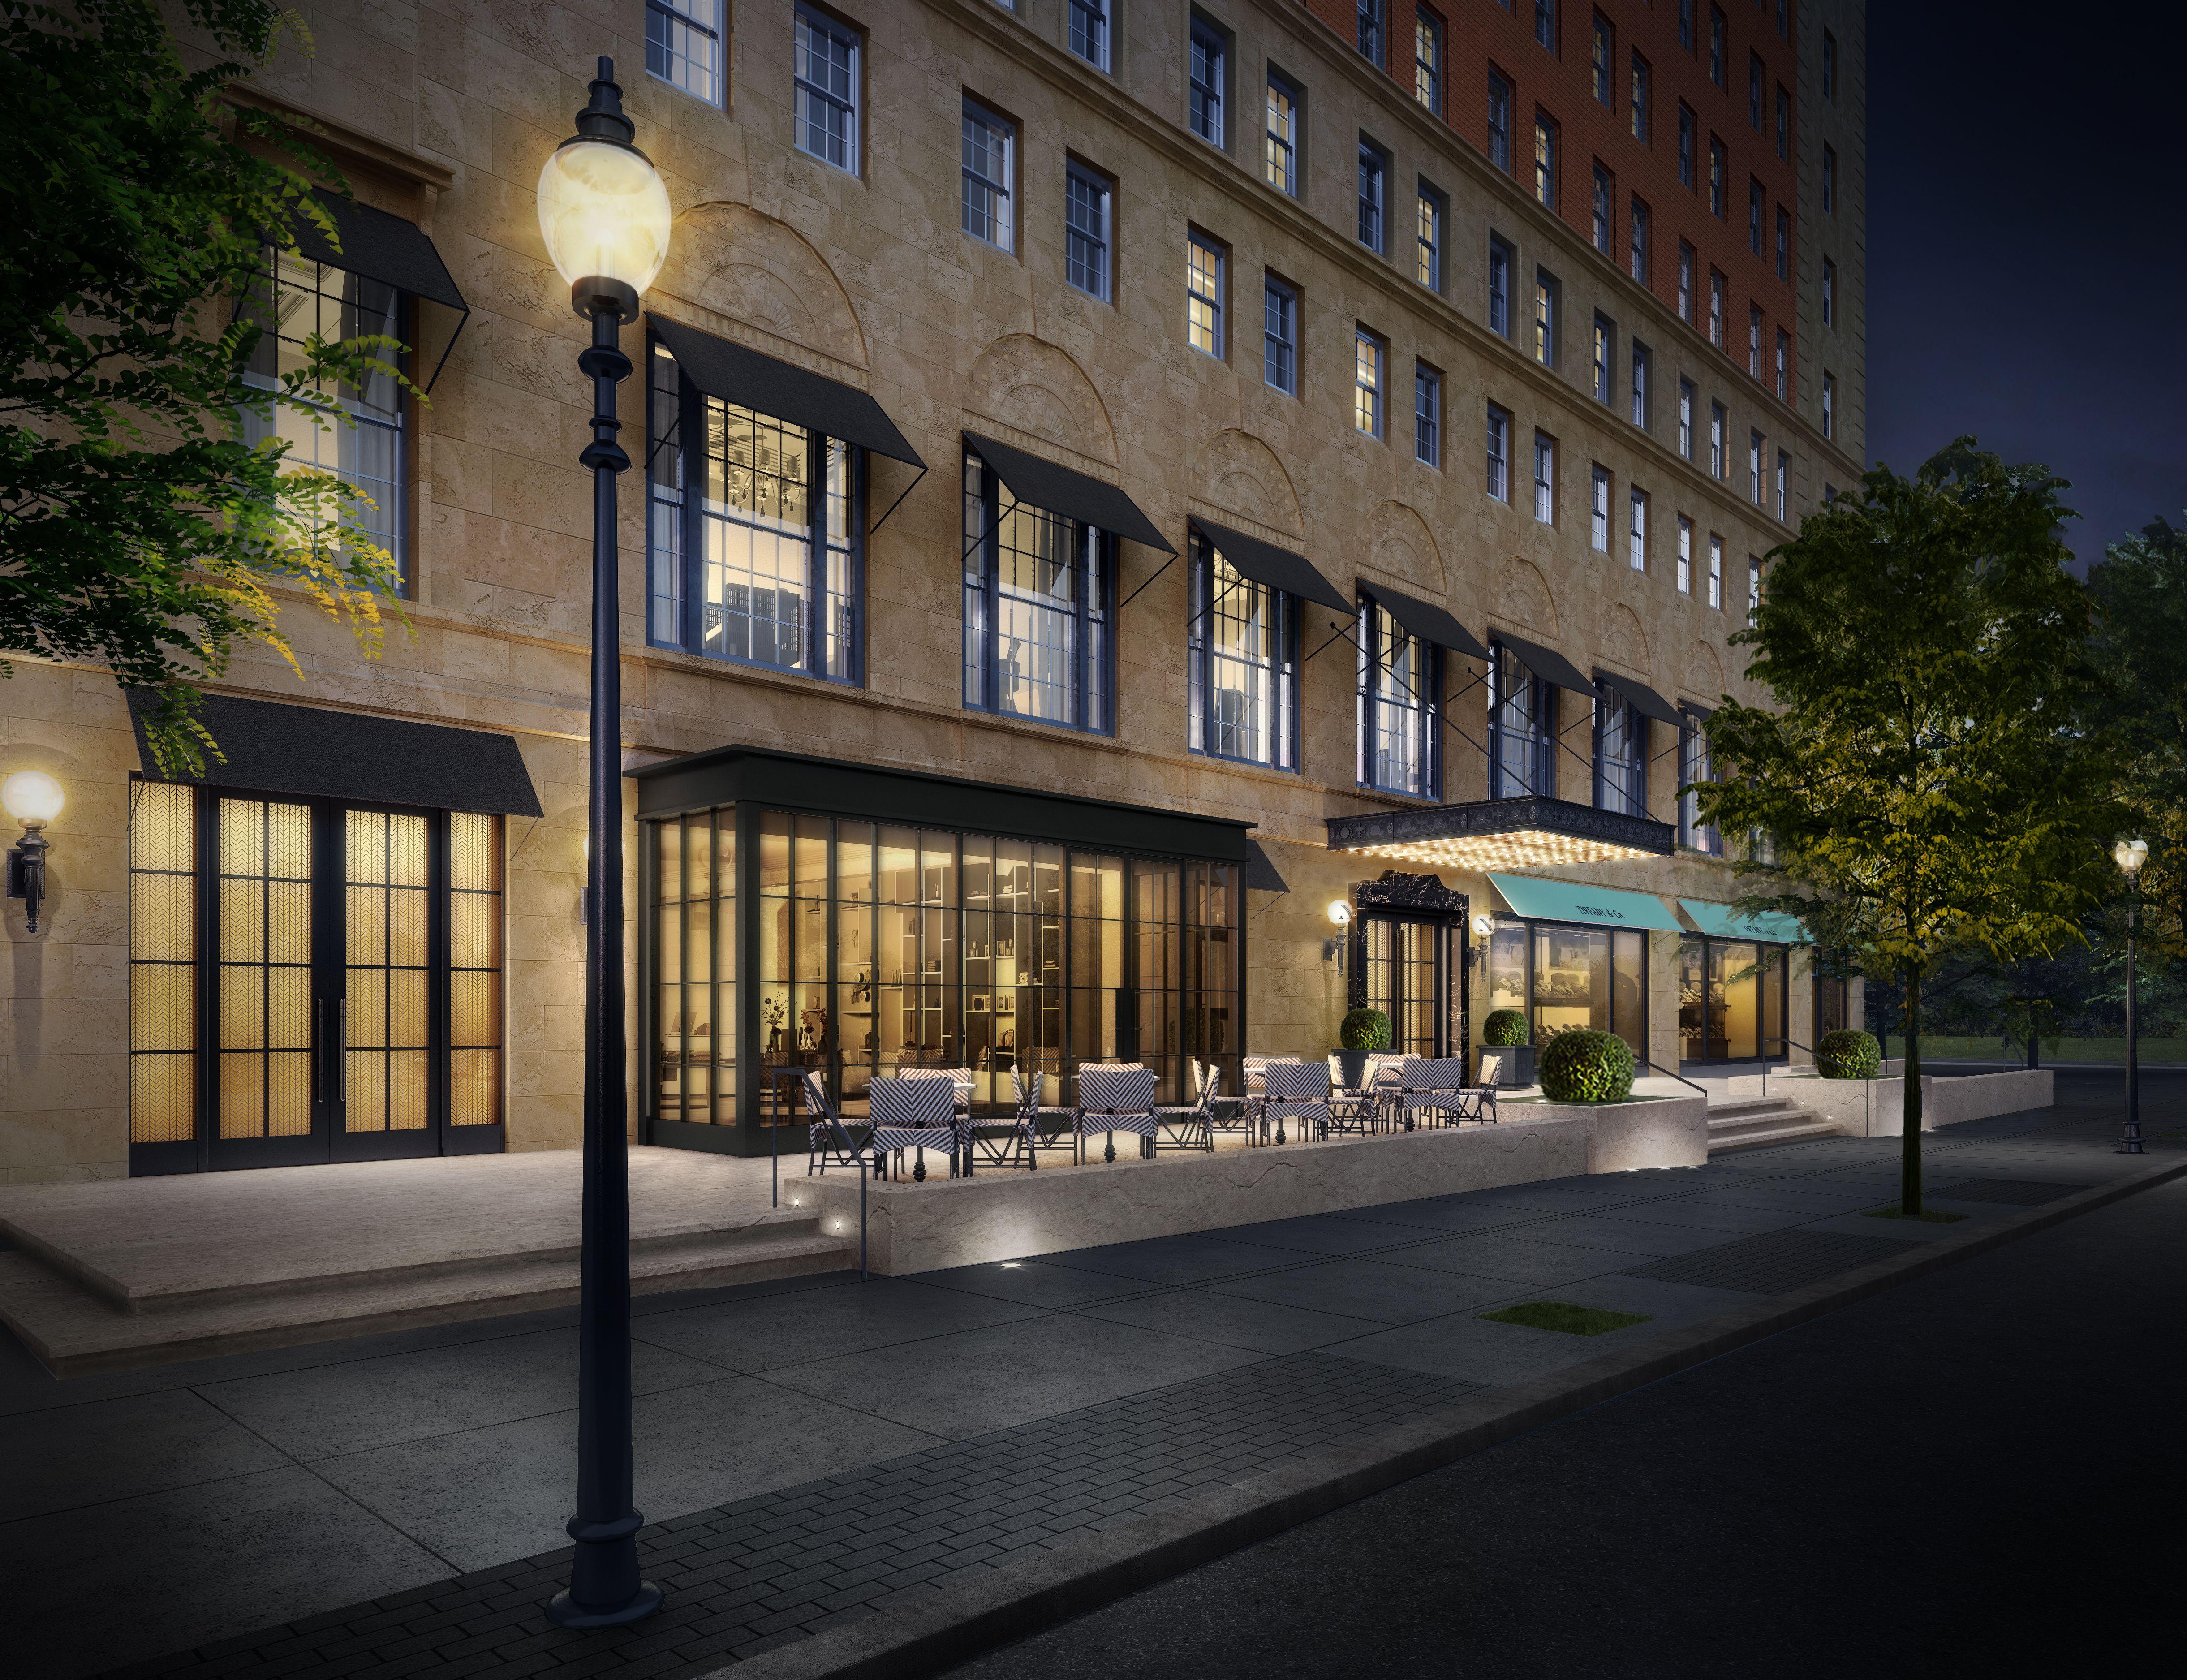 Don T Call Her The Ritz She S The Taj No More Say Hello To The Newbury Boston S Grand Dame Of Hotels The Boston Globe